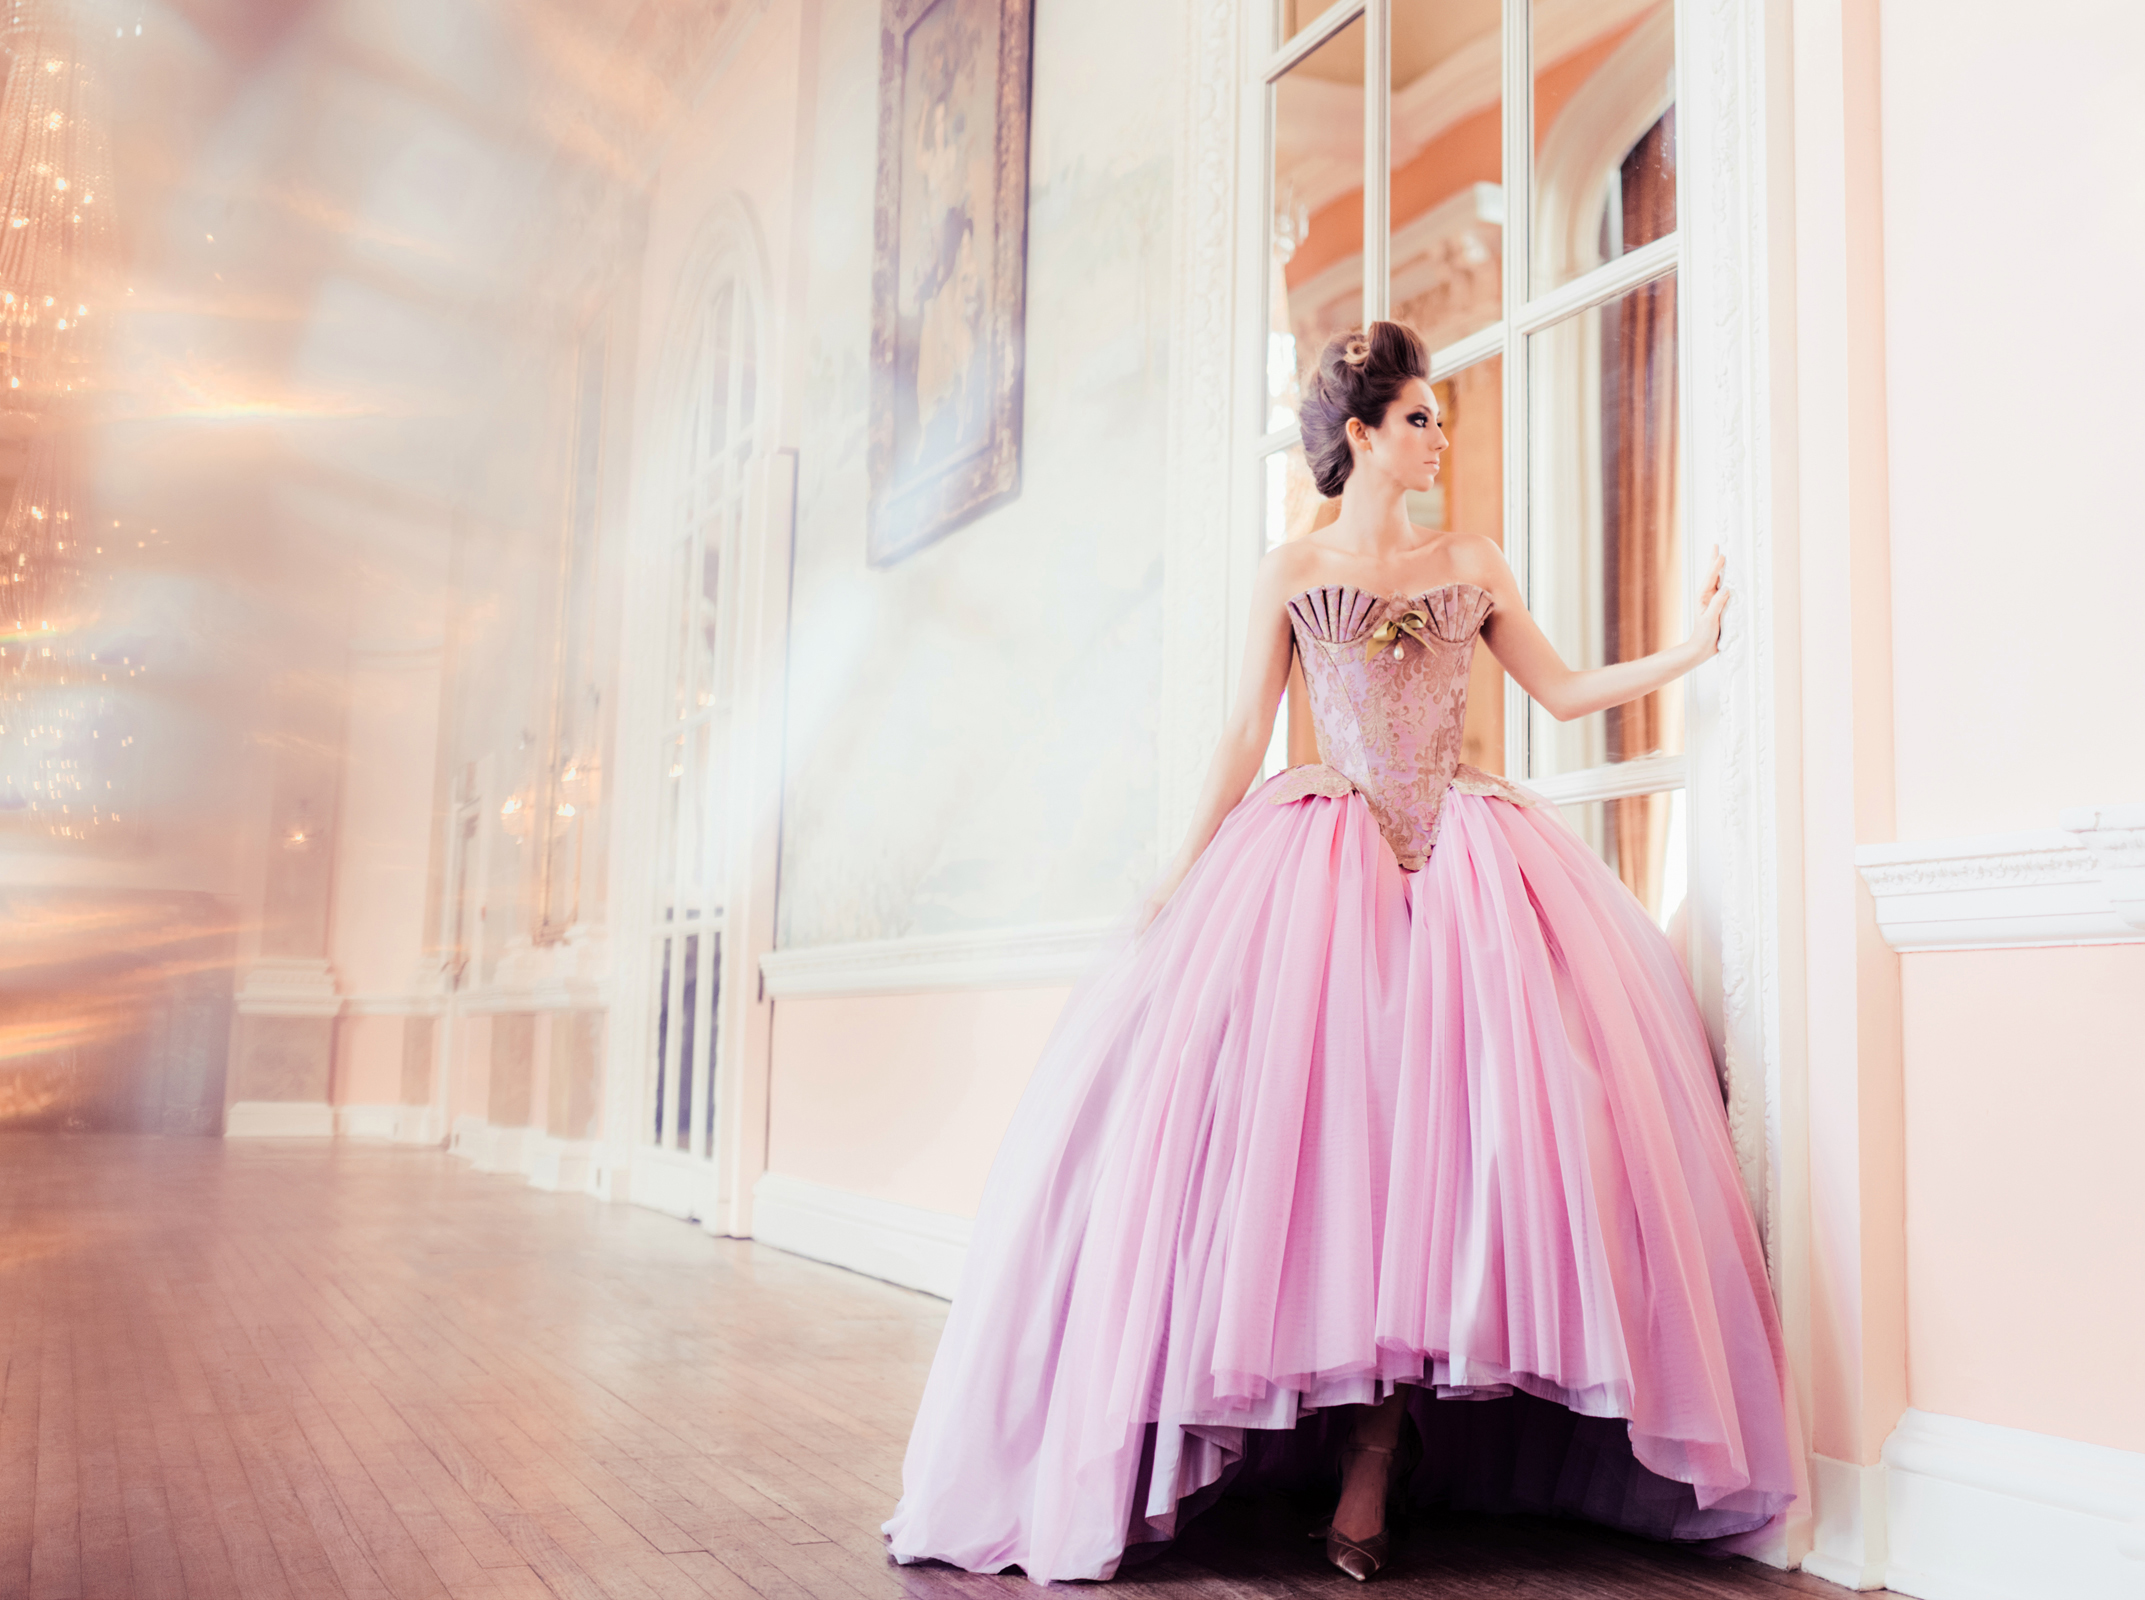 Unique Corseted Bridal Gowns - Chantal Mallett Bridal Couture